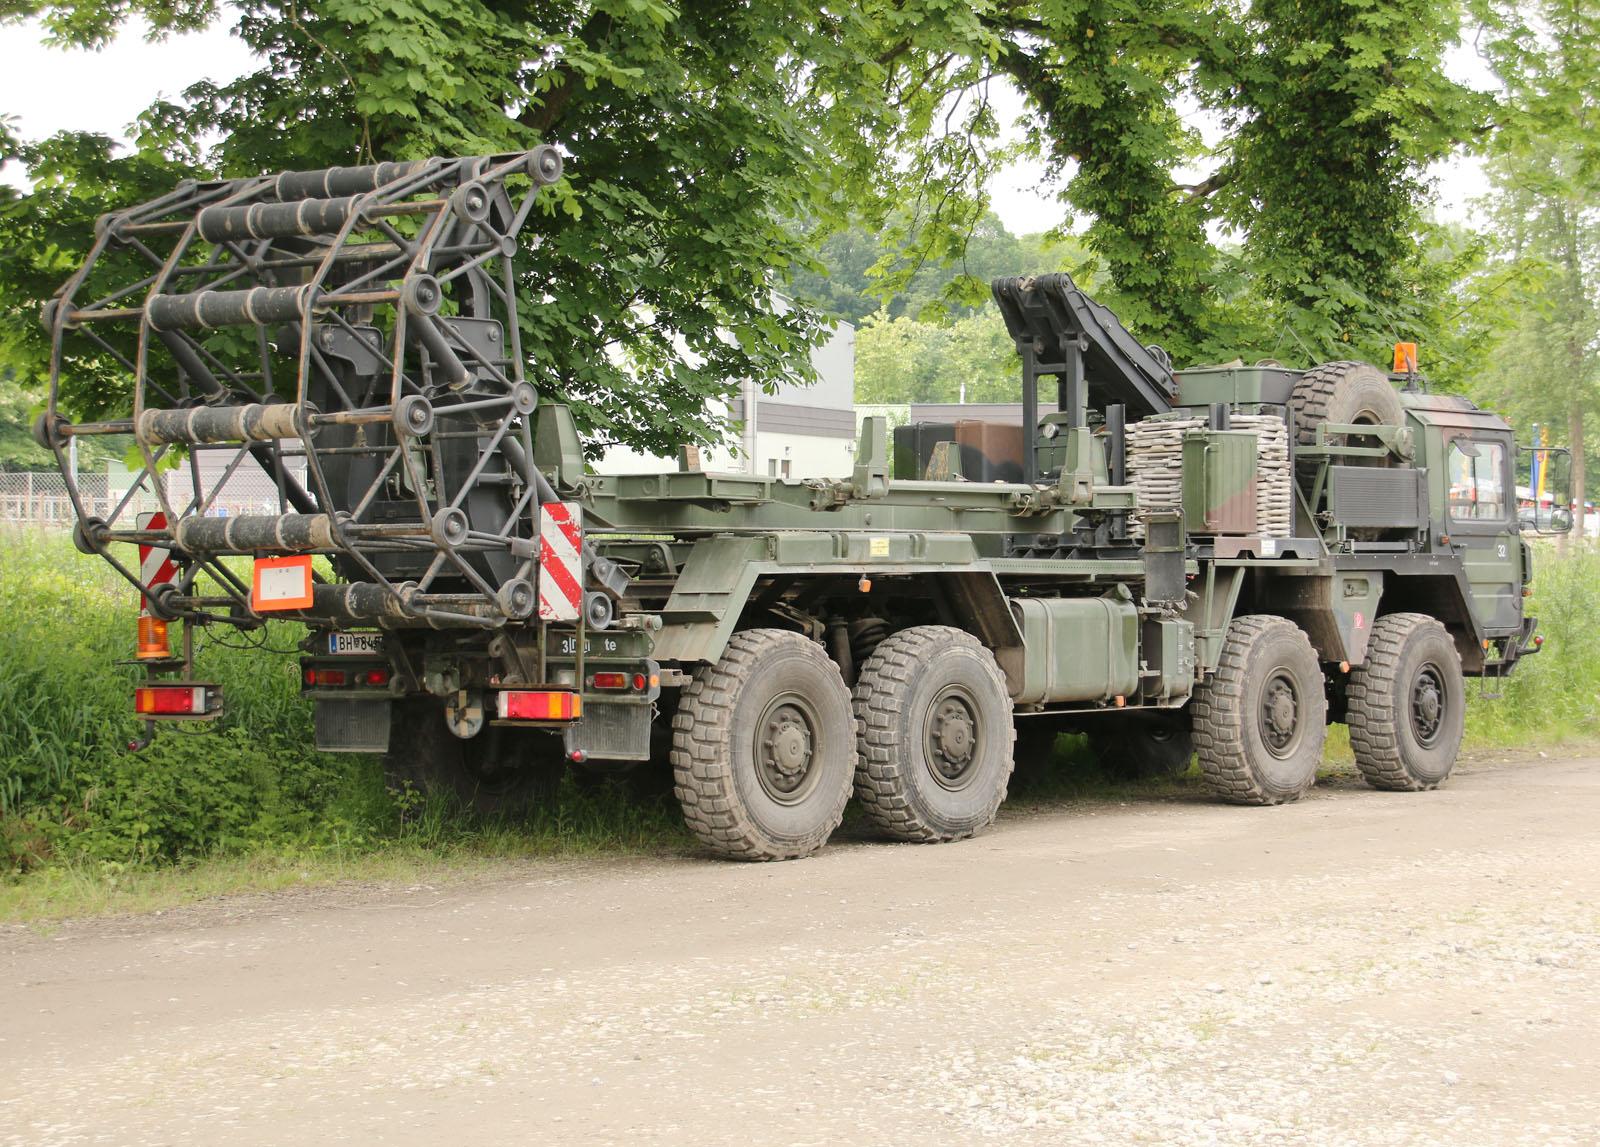 Plattform ist der LKW 15t mil glw KAT I A1 8x8 der MAN Nutzfahrzeuge AG © Doppeladler.com